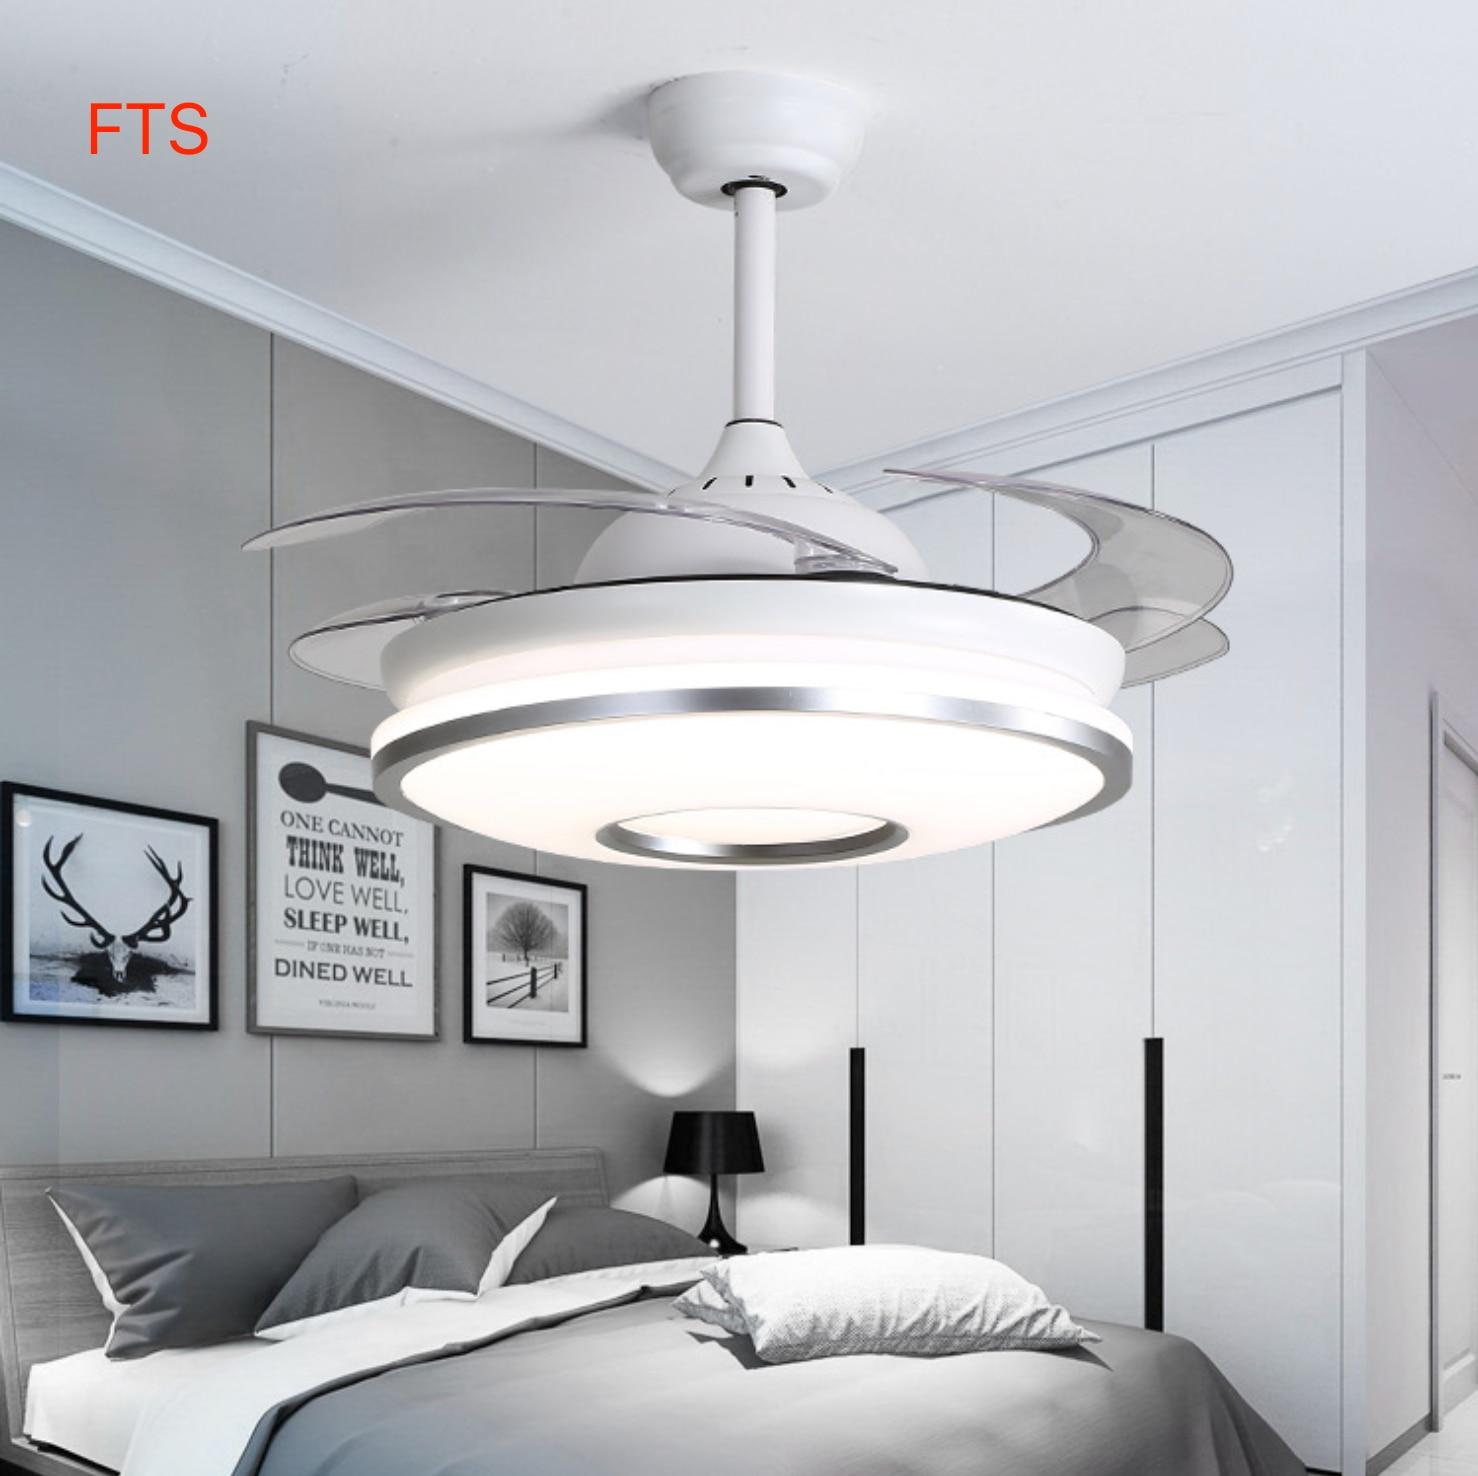 Stealth Fan Light Dimming Silver Remote Control Led Ceiling Fan For Living Room Simple Fashion Smart Modern Bedroom Fan Light